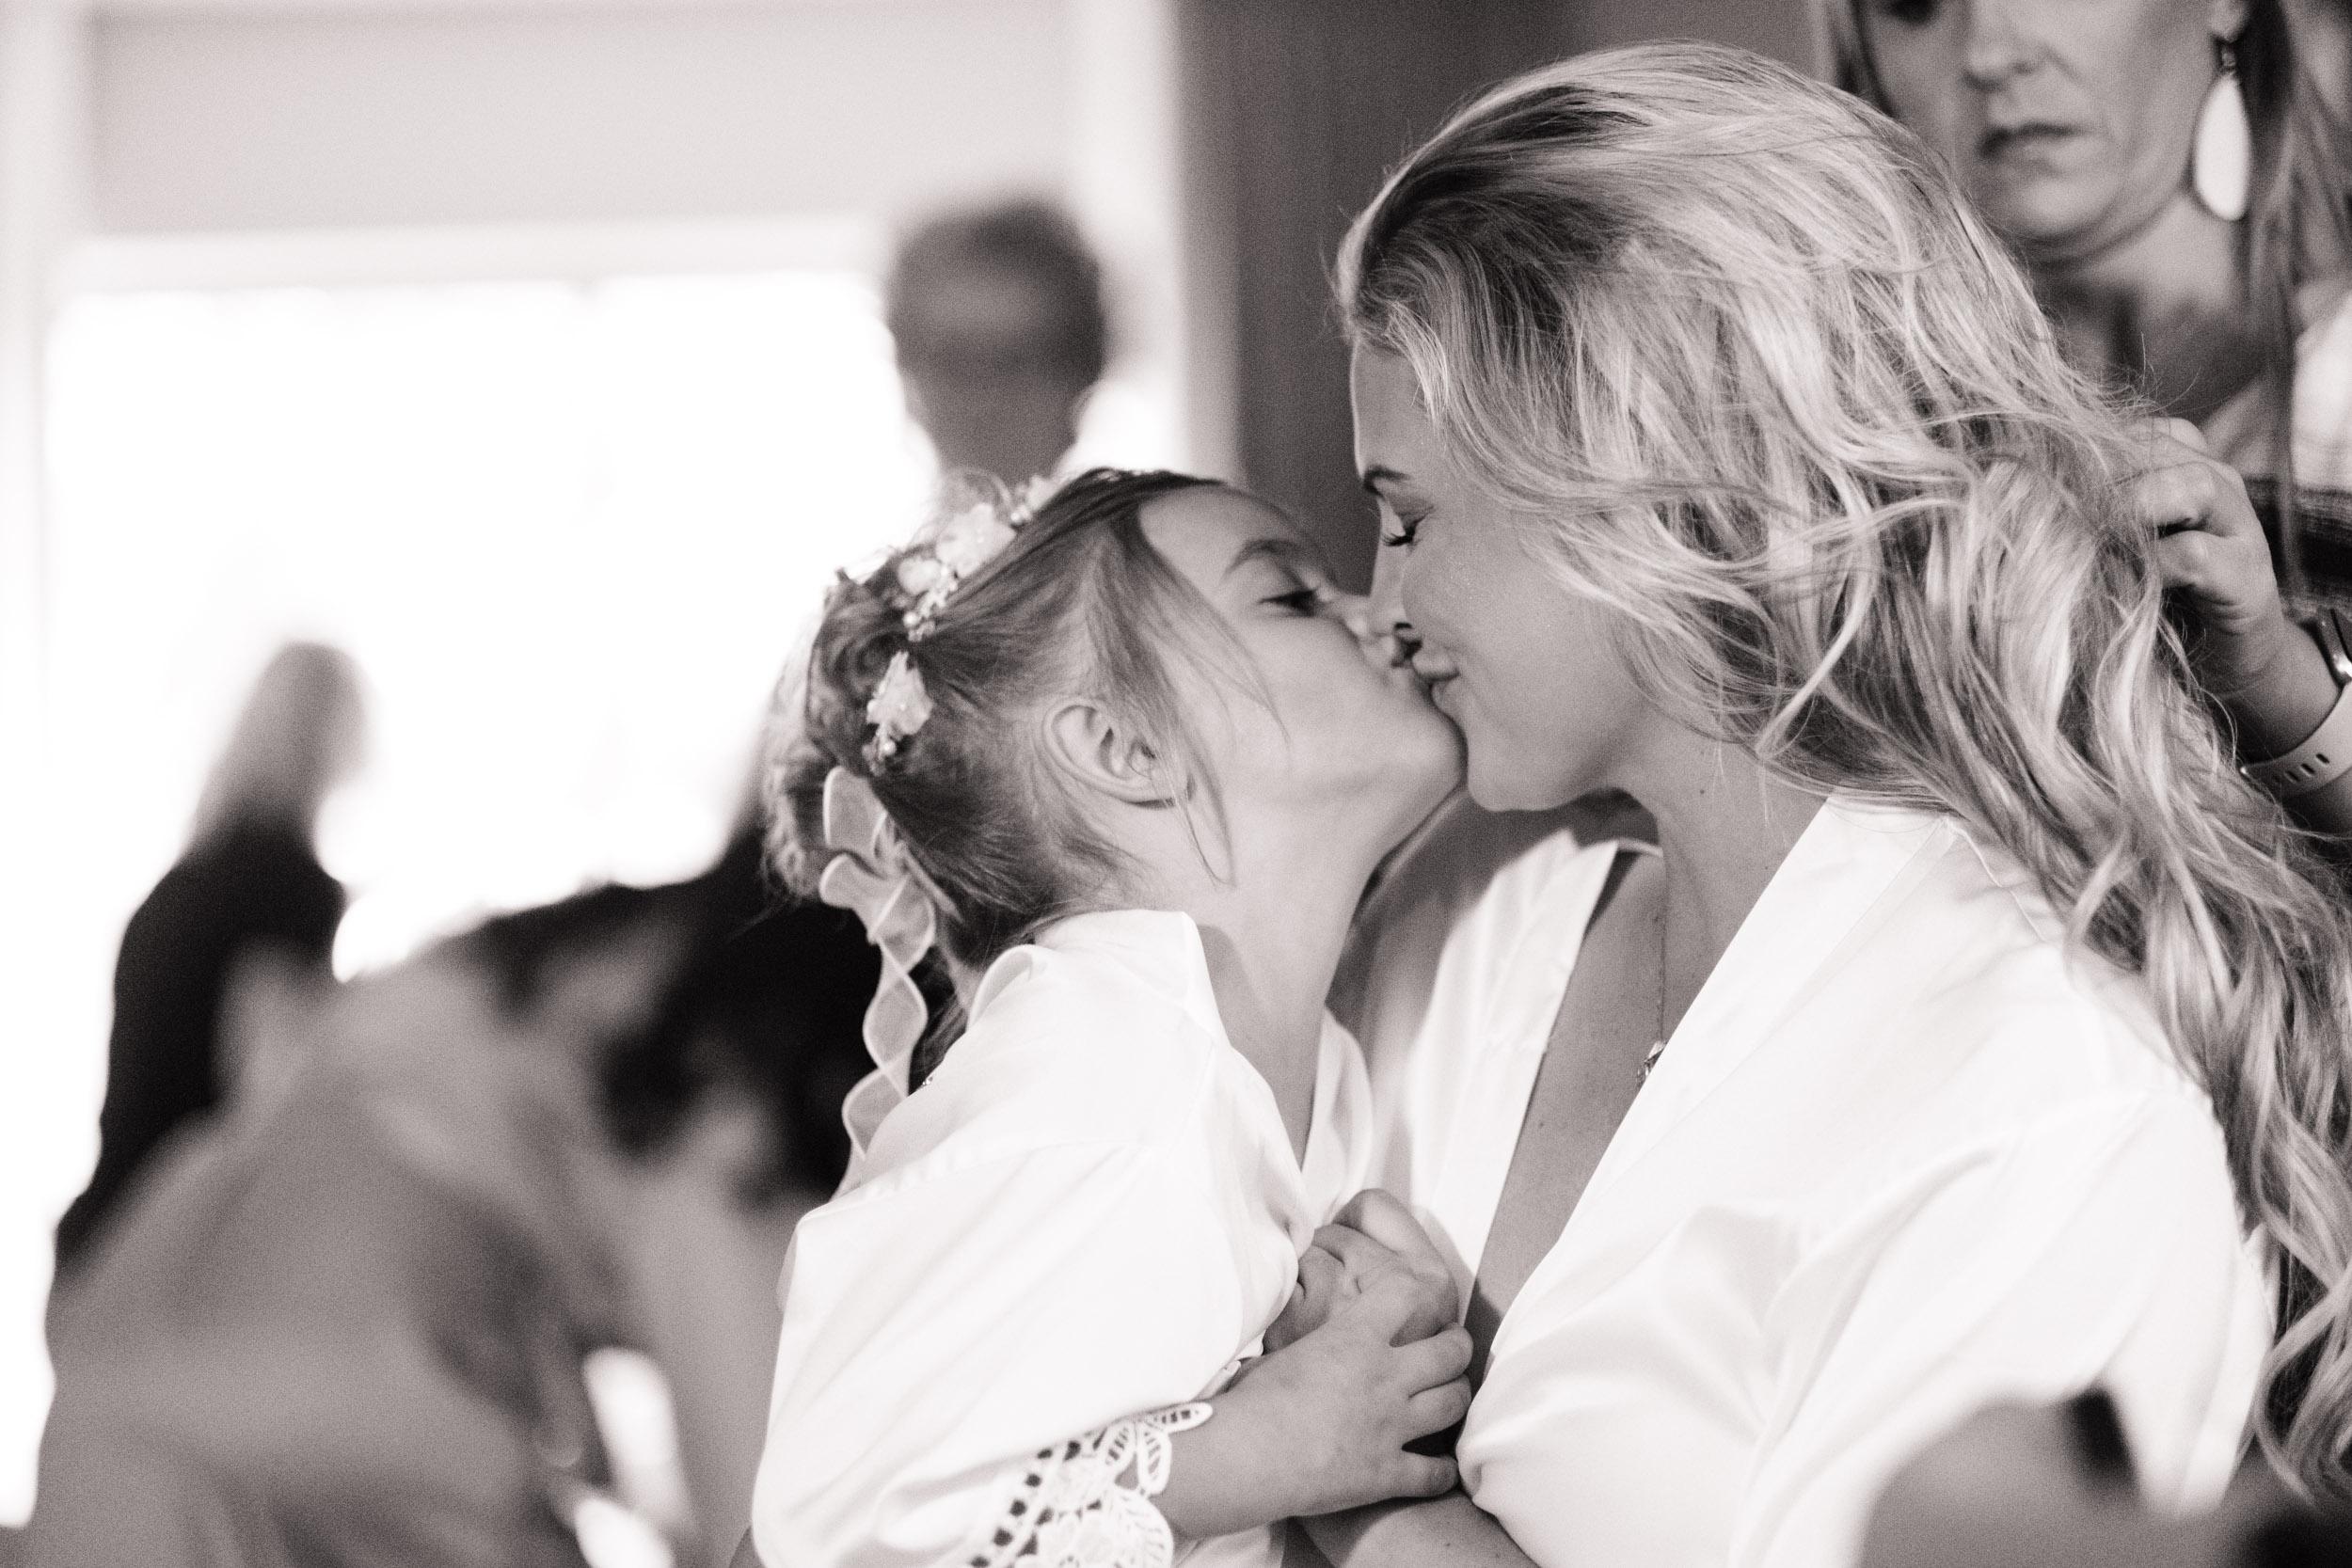 19-06-01 Megan Josh - Nicholas Conservatory Wedding-2.jpg